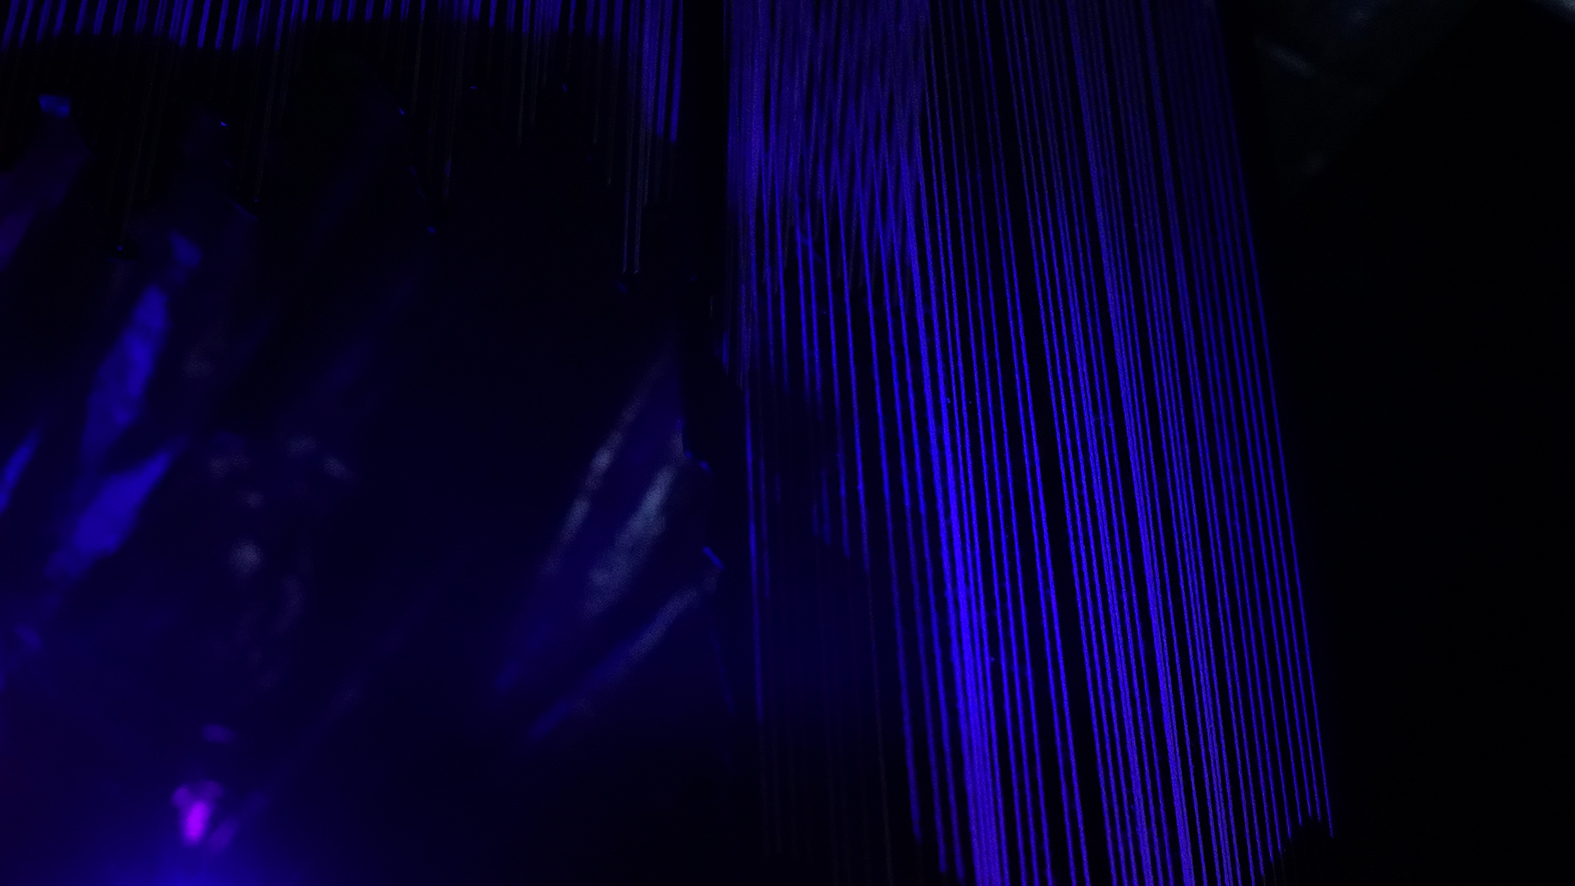 DSC04070.JPG